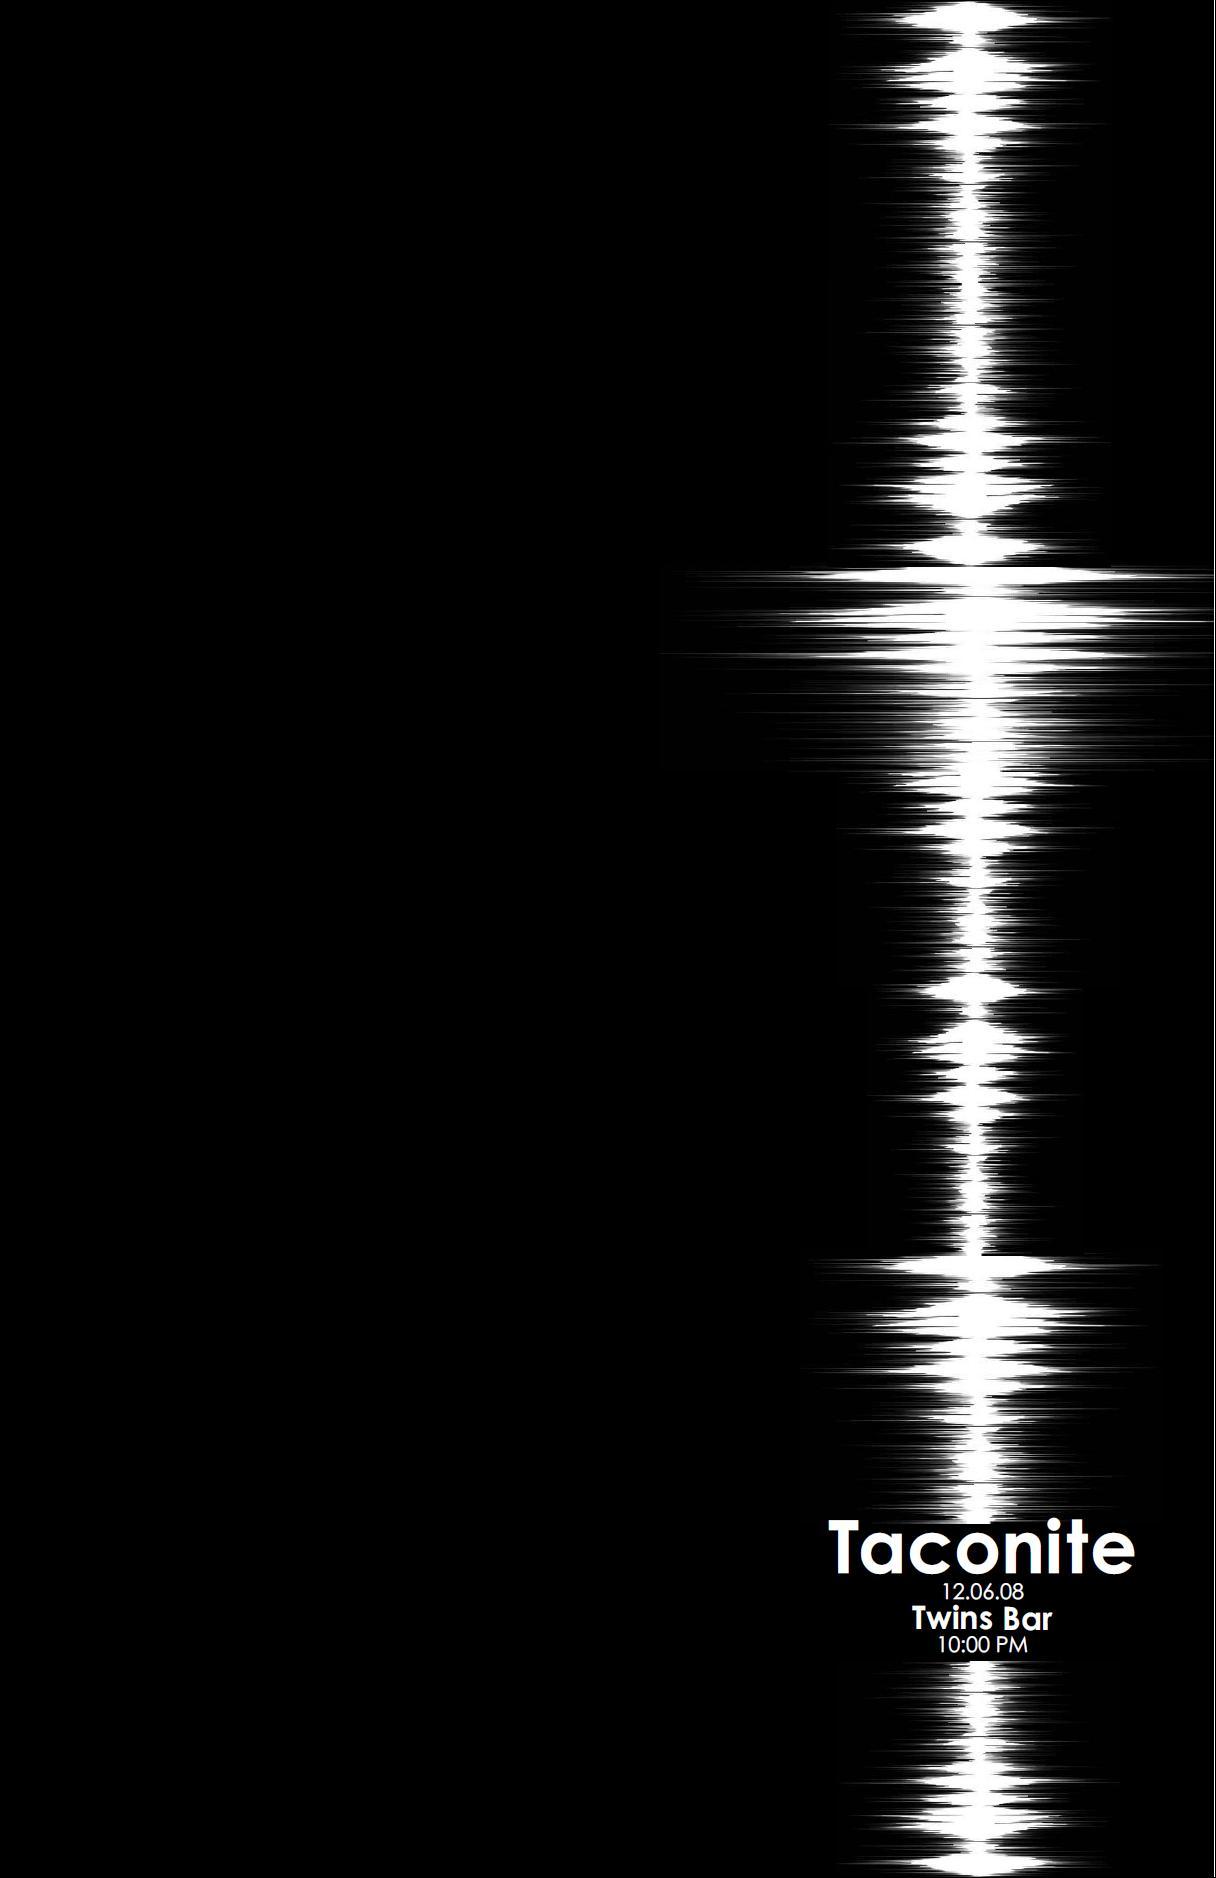 taconite sound wave.JPG